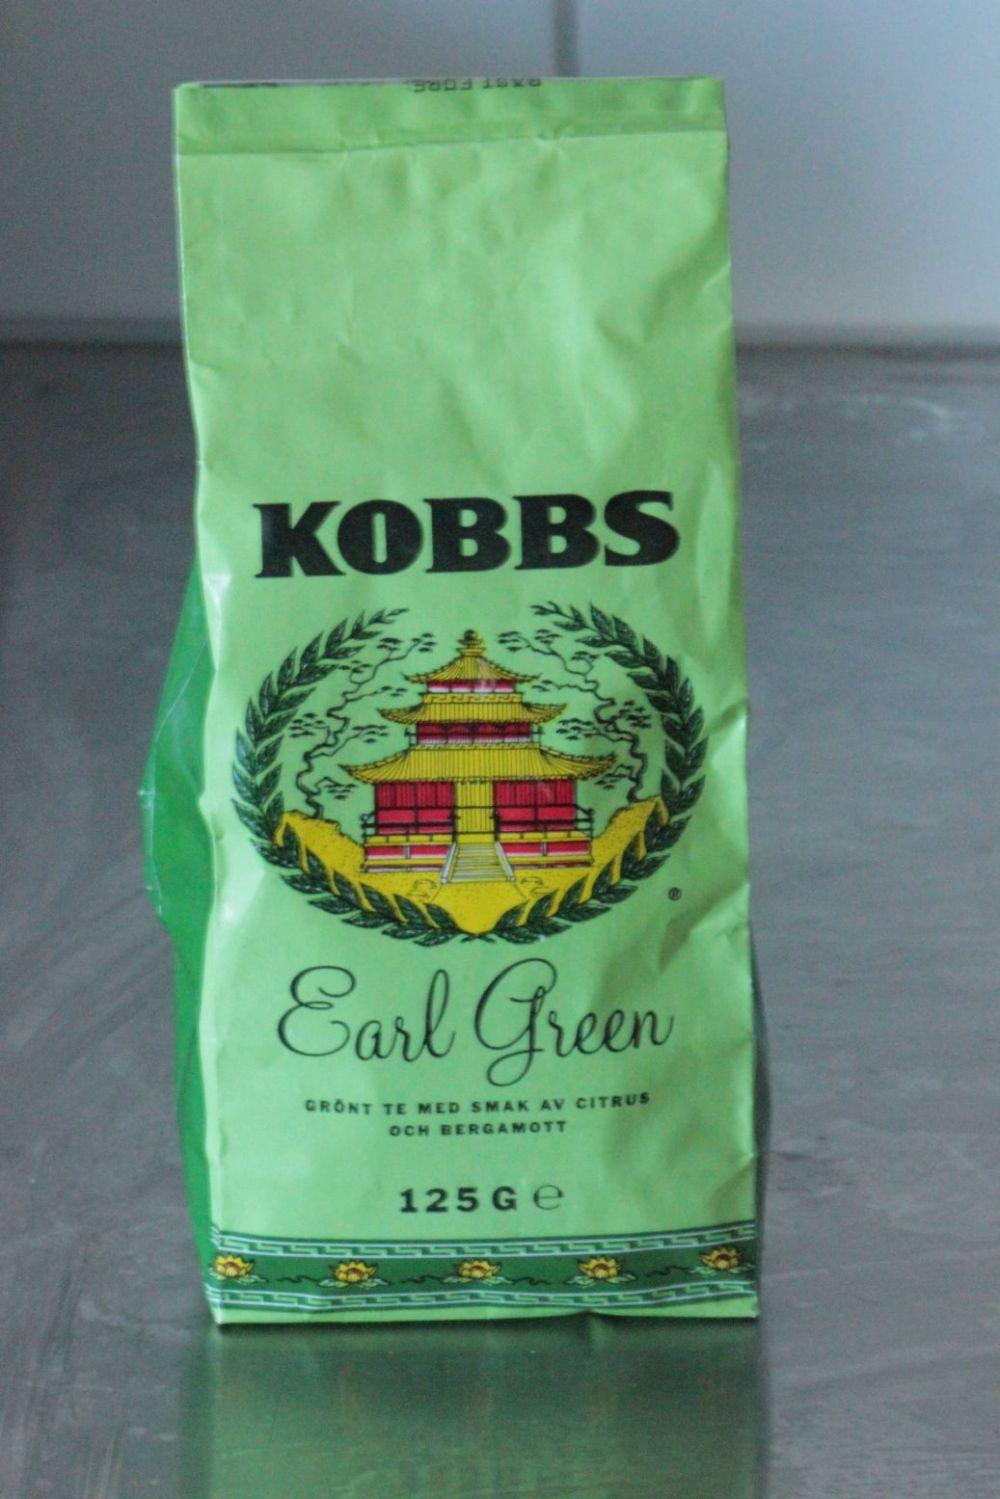 earl gray herbata zielona kobbs szwedzka ekologiczna